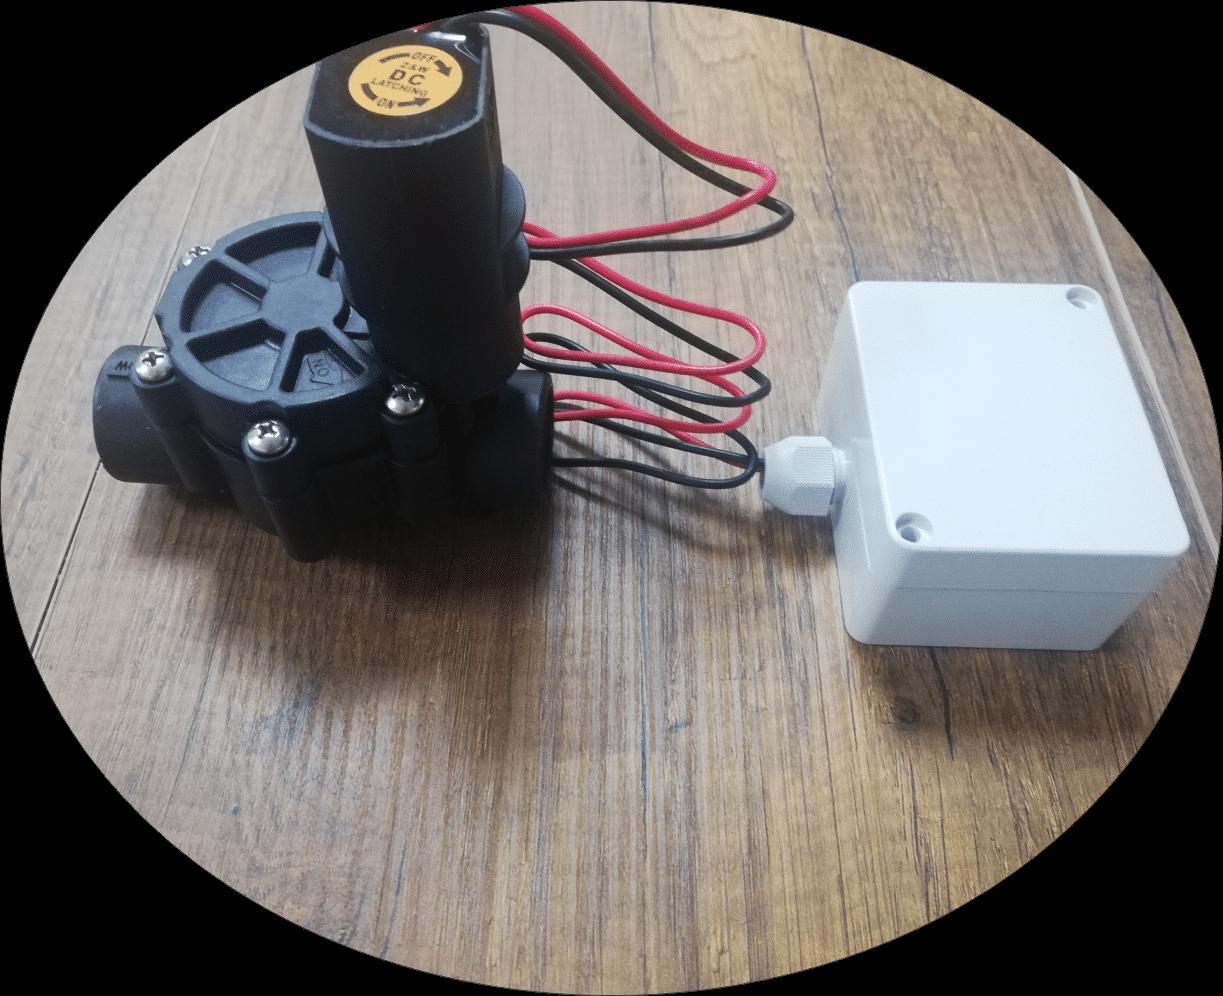 Kablosuz vana, Kablosuz hidrolik sulama sistemi vana kontrol ünitesi